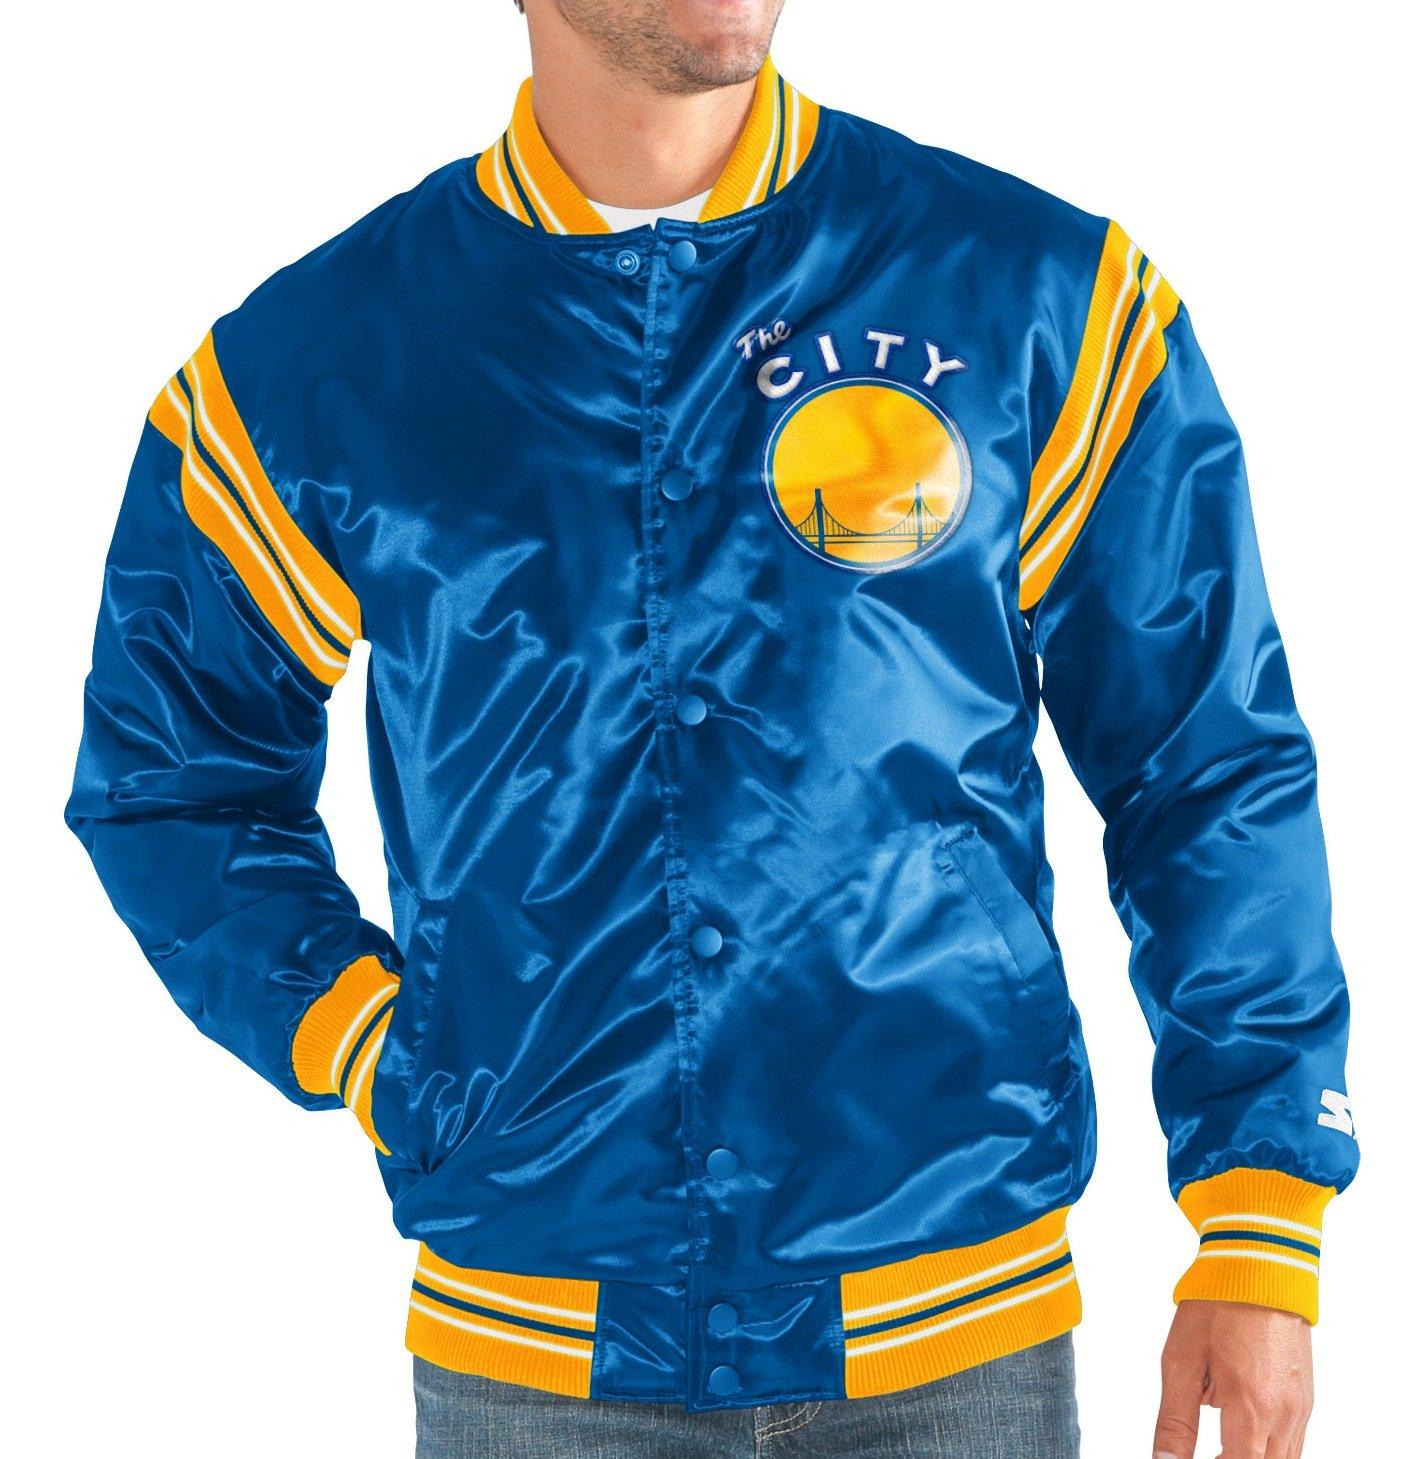 Golden State Warriors NBA Men's Starter ''The Enforcer'' HWC Premium Satin Jacket (3XL) by Starter